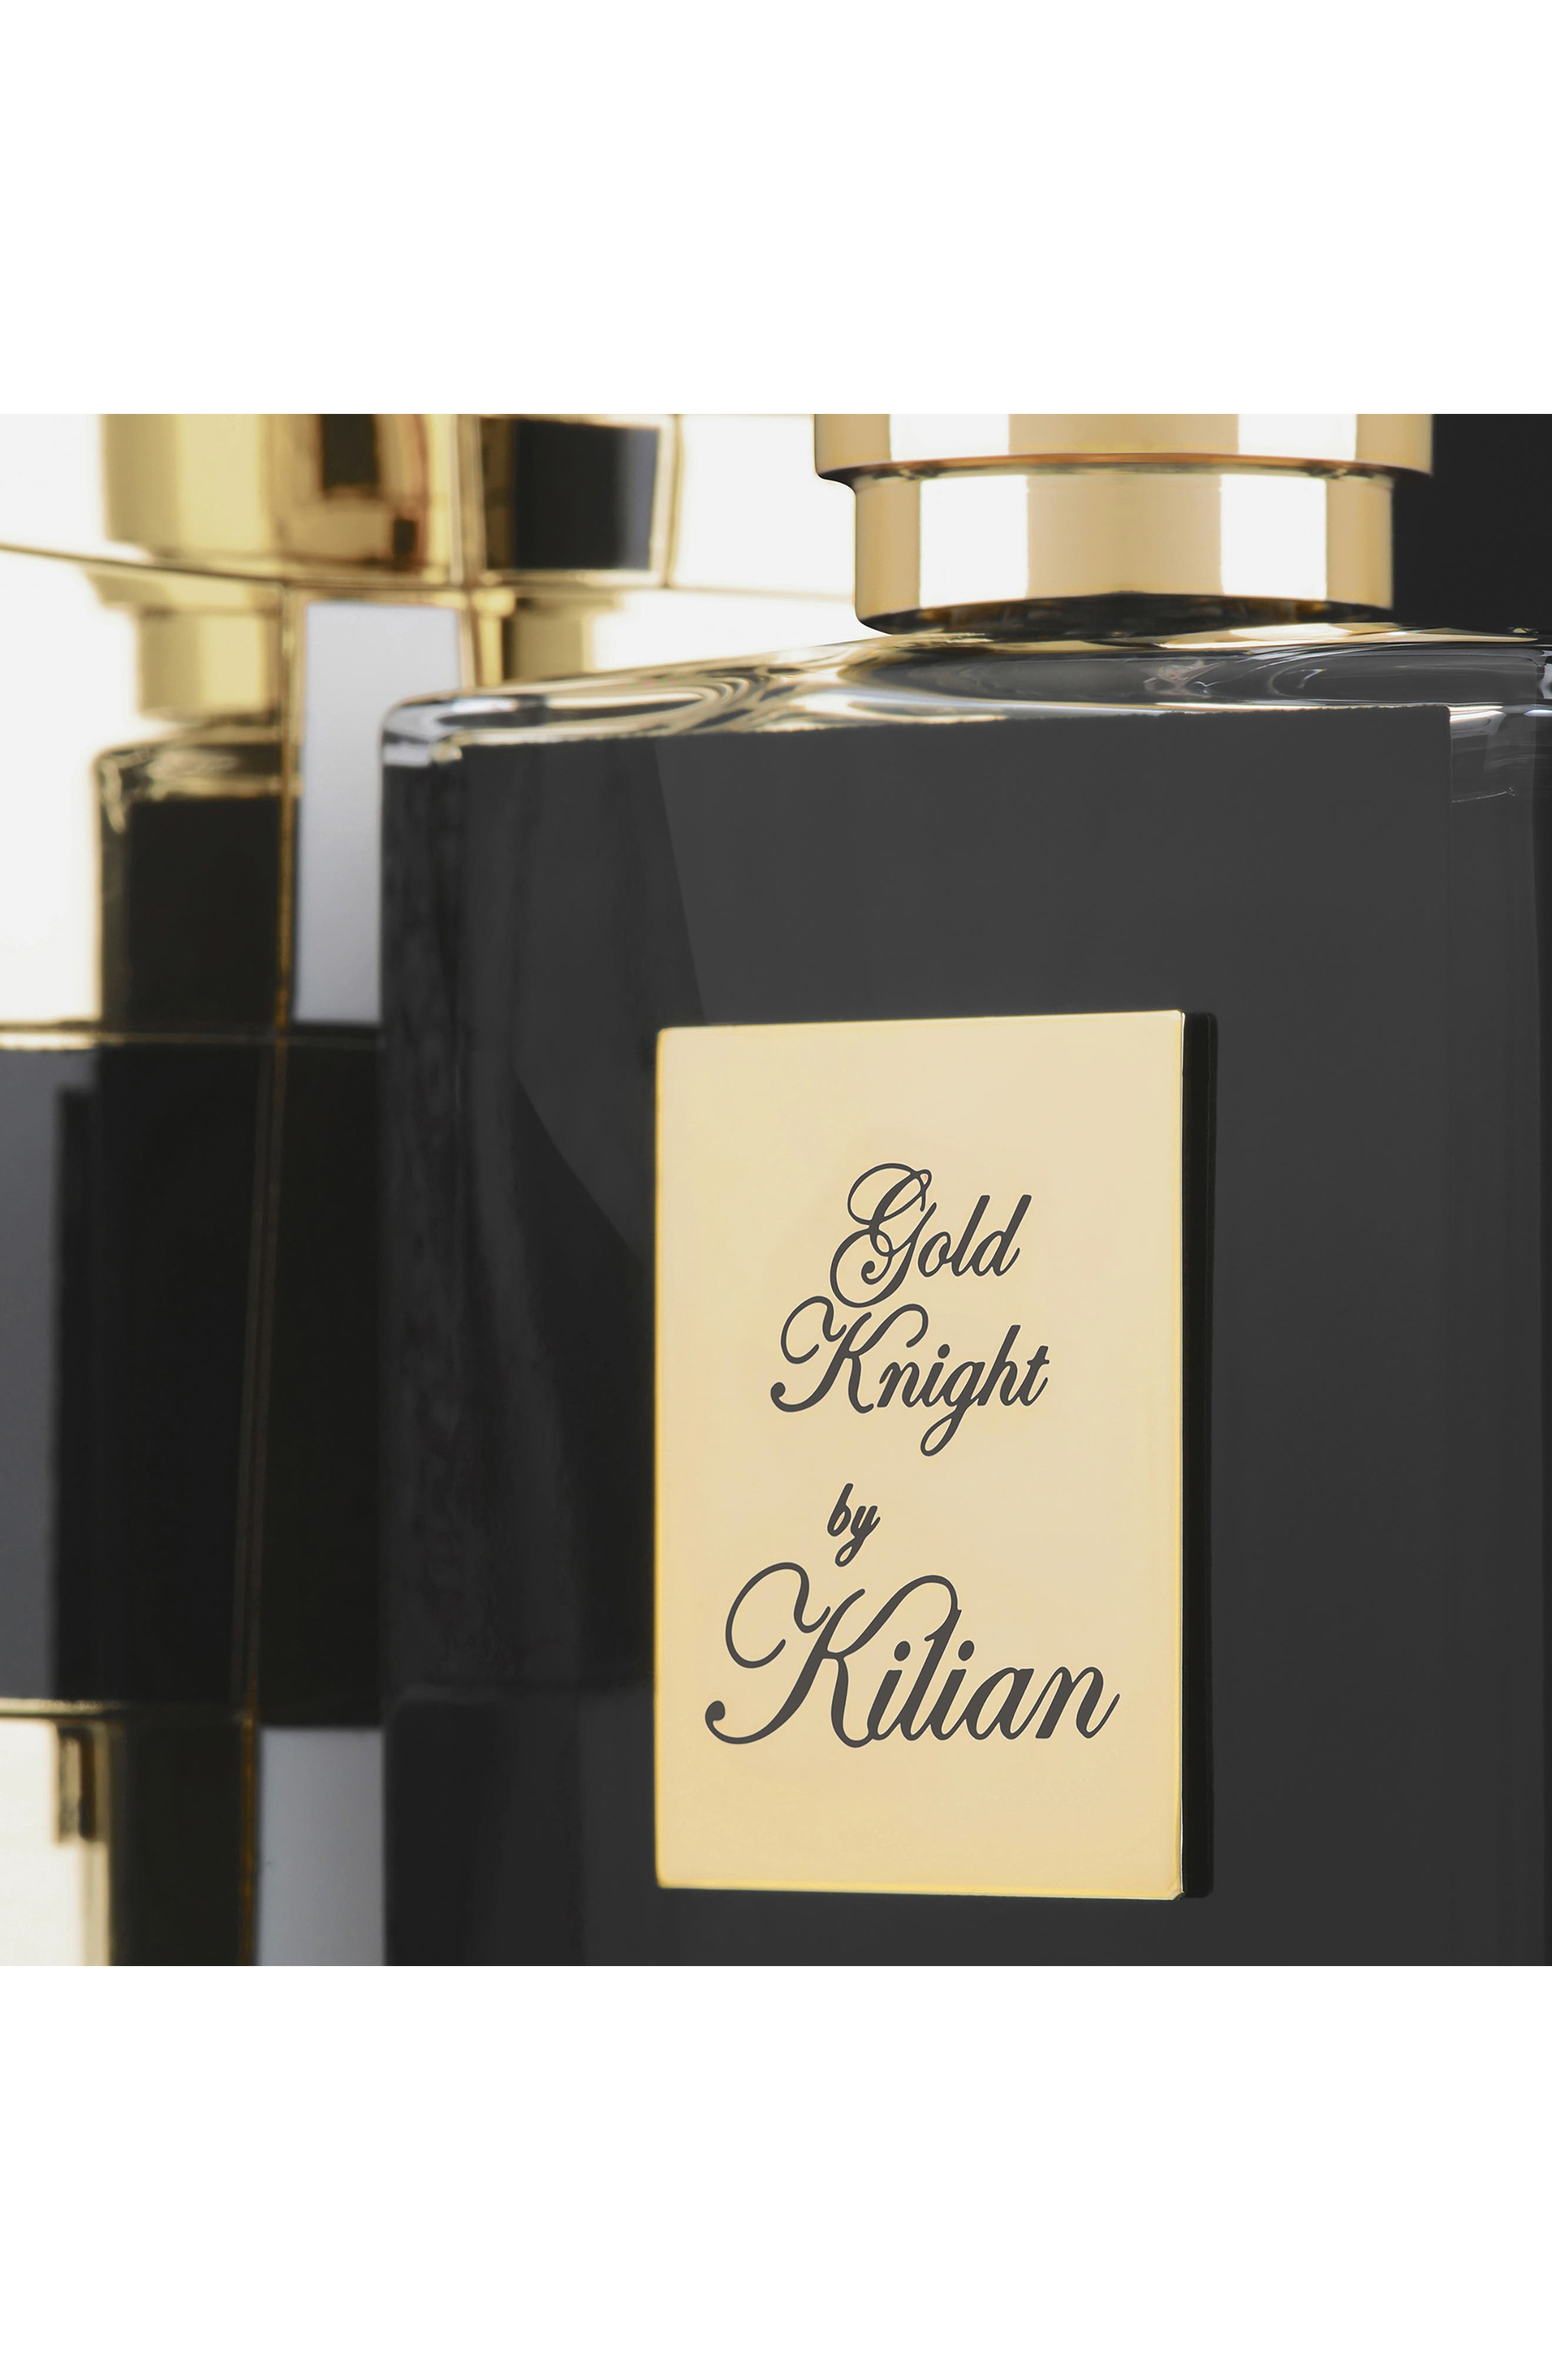 Gold Knight Refillable Spray Collector's Edition,                             Alternate thumbnail 5, color,                             NO COLOR